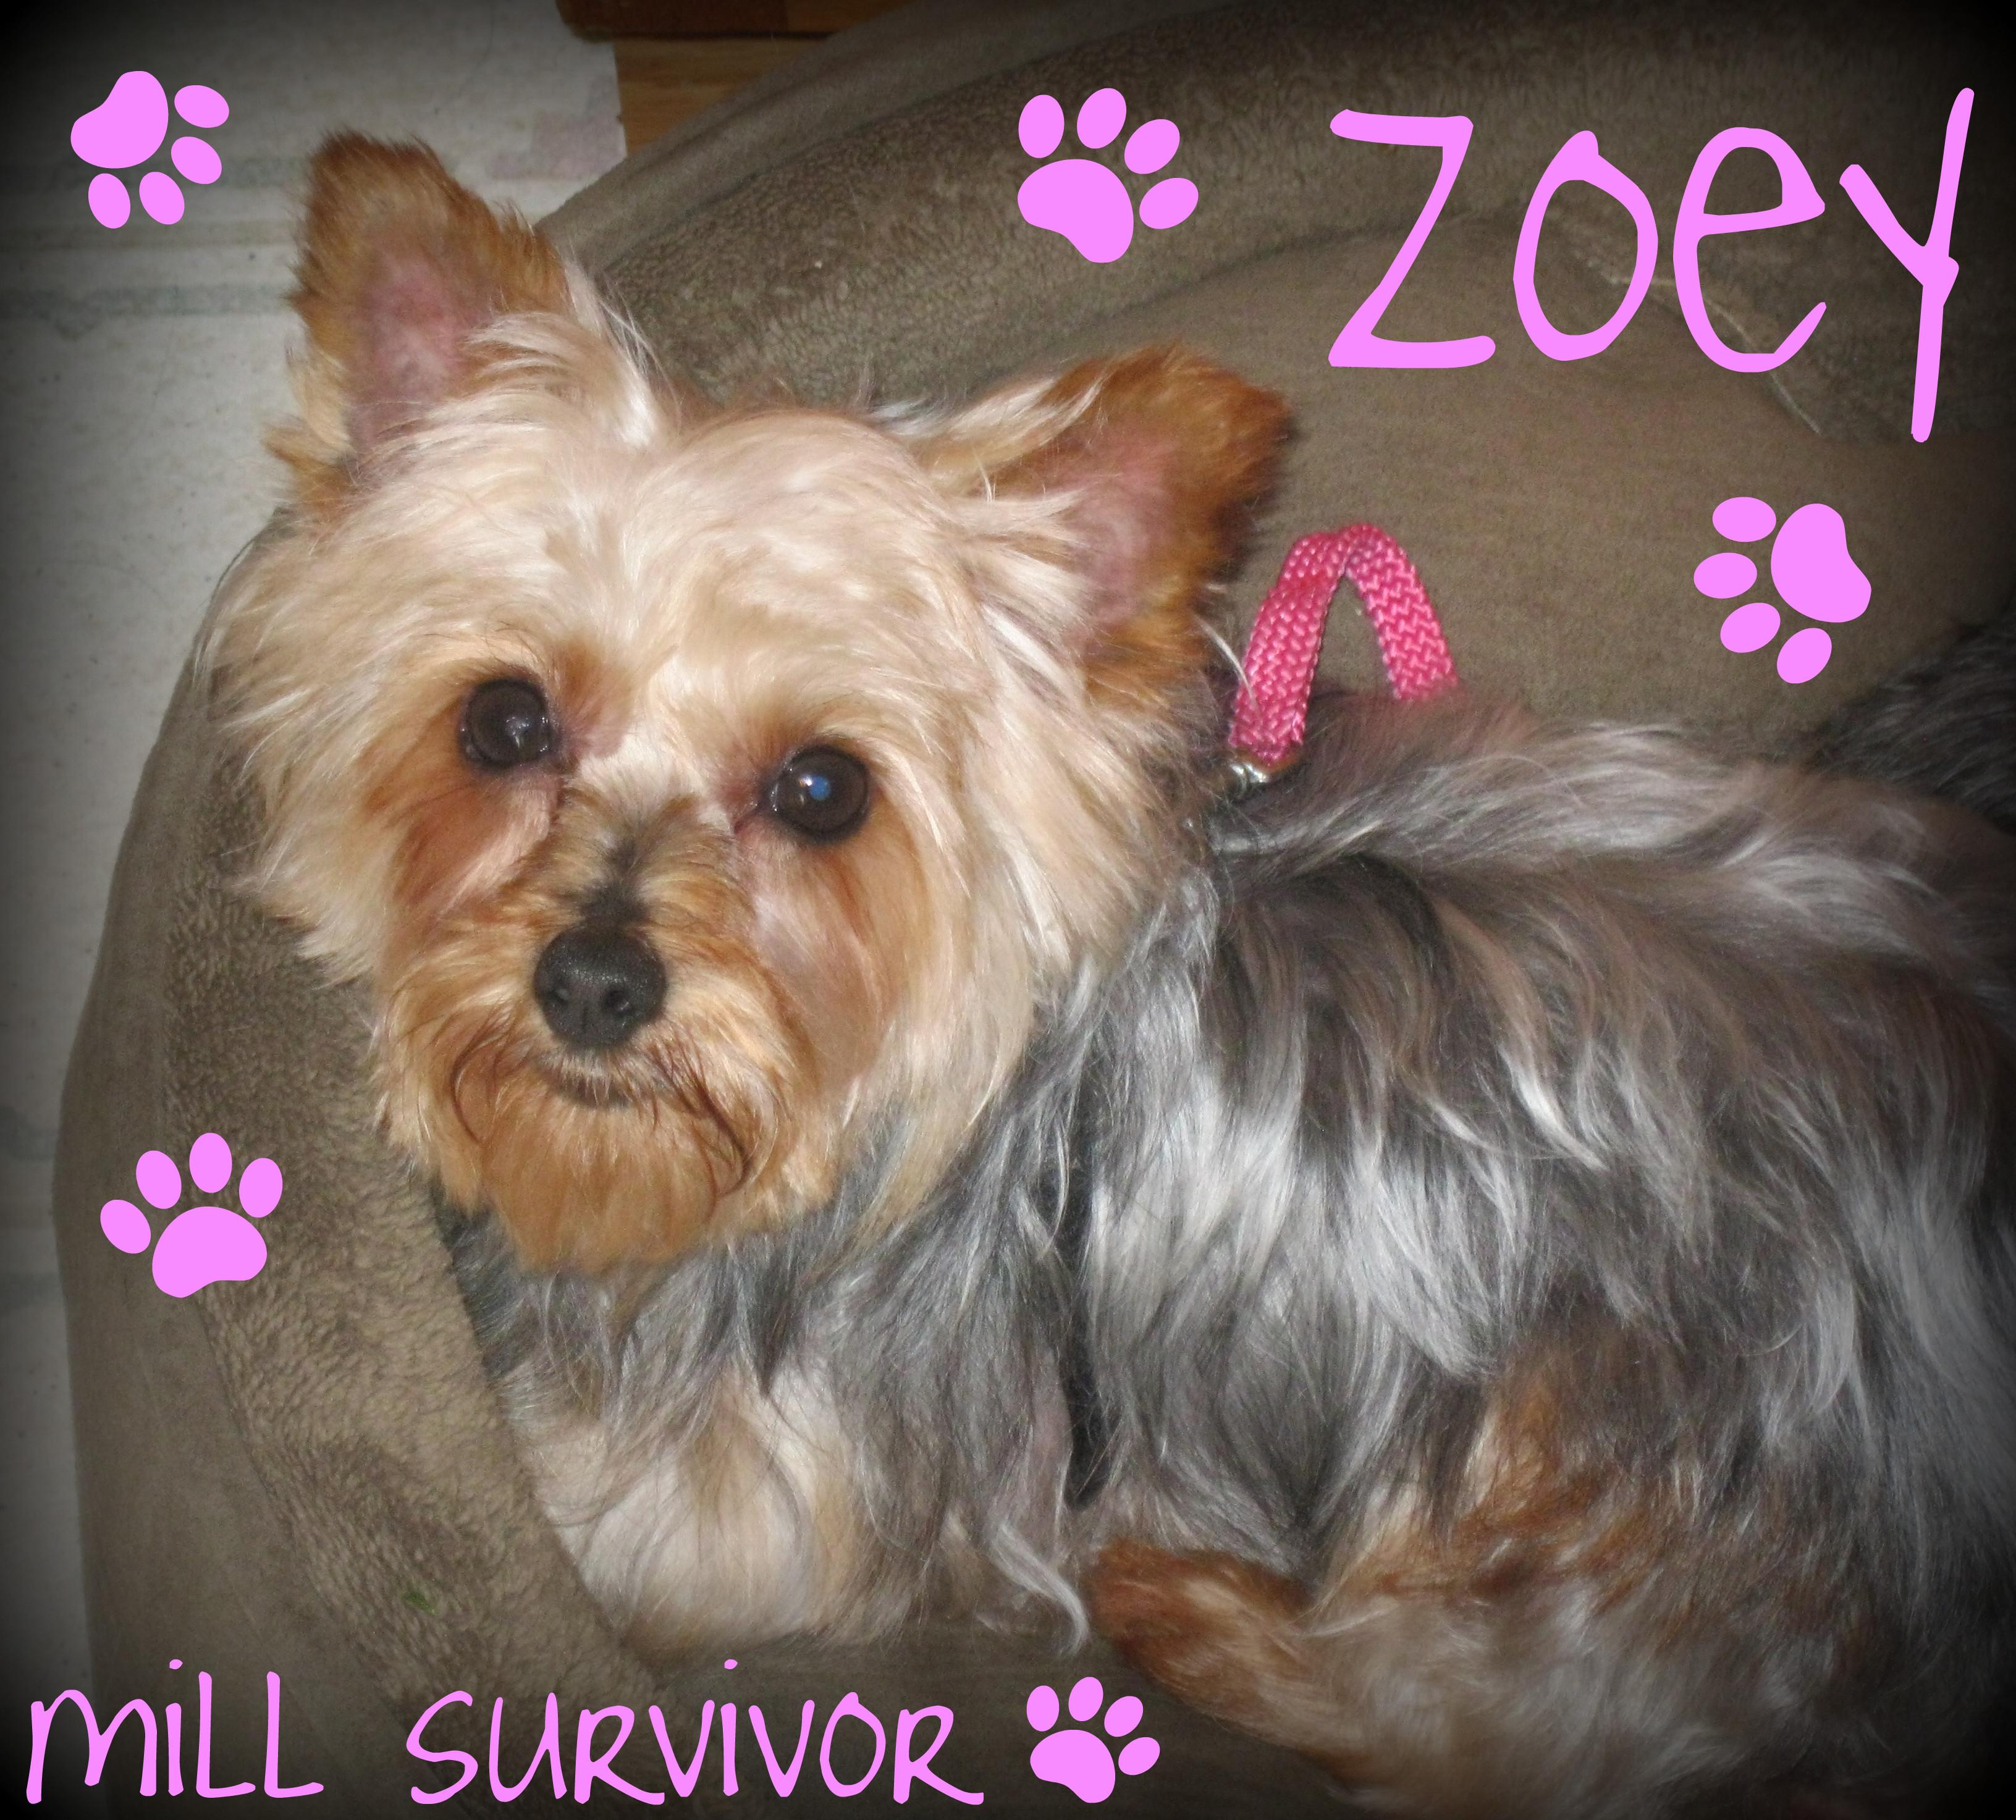 Puppy Mill Awareness